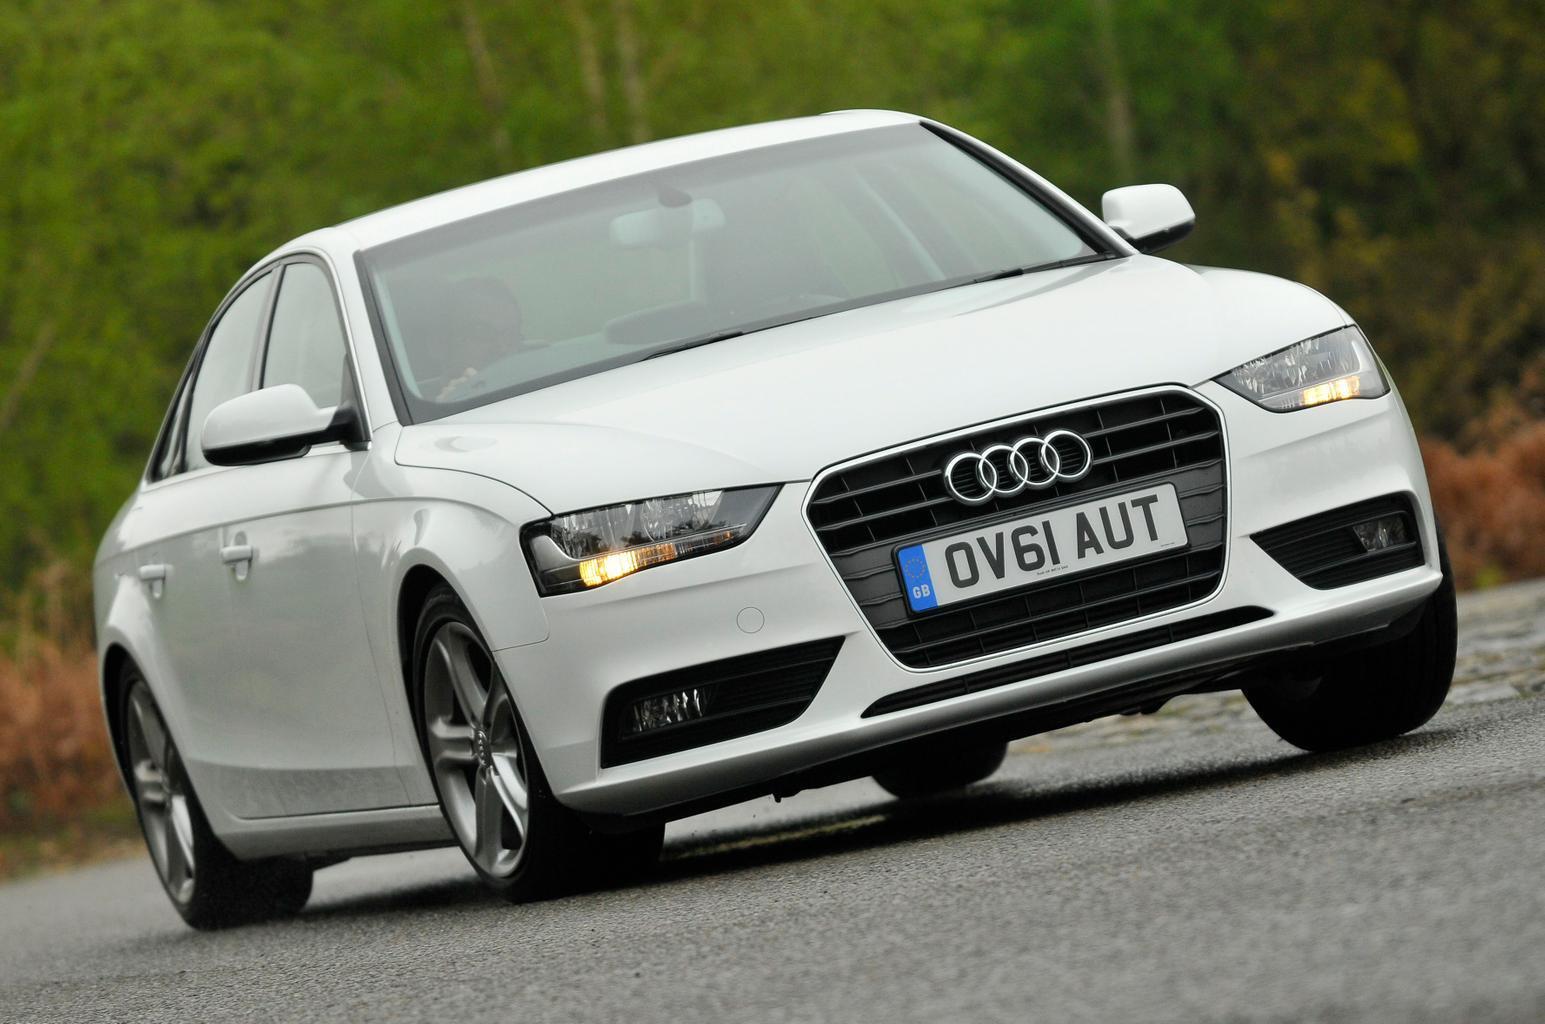 Used Audi A4 vs BMW 3 Series vs Mercedes C-Class vs Citroen DS5